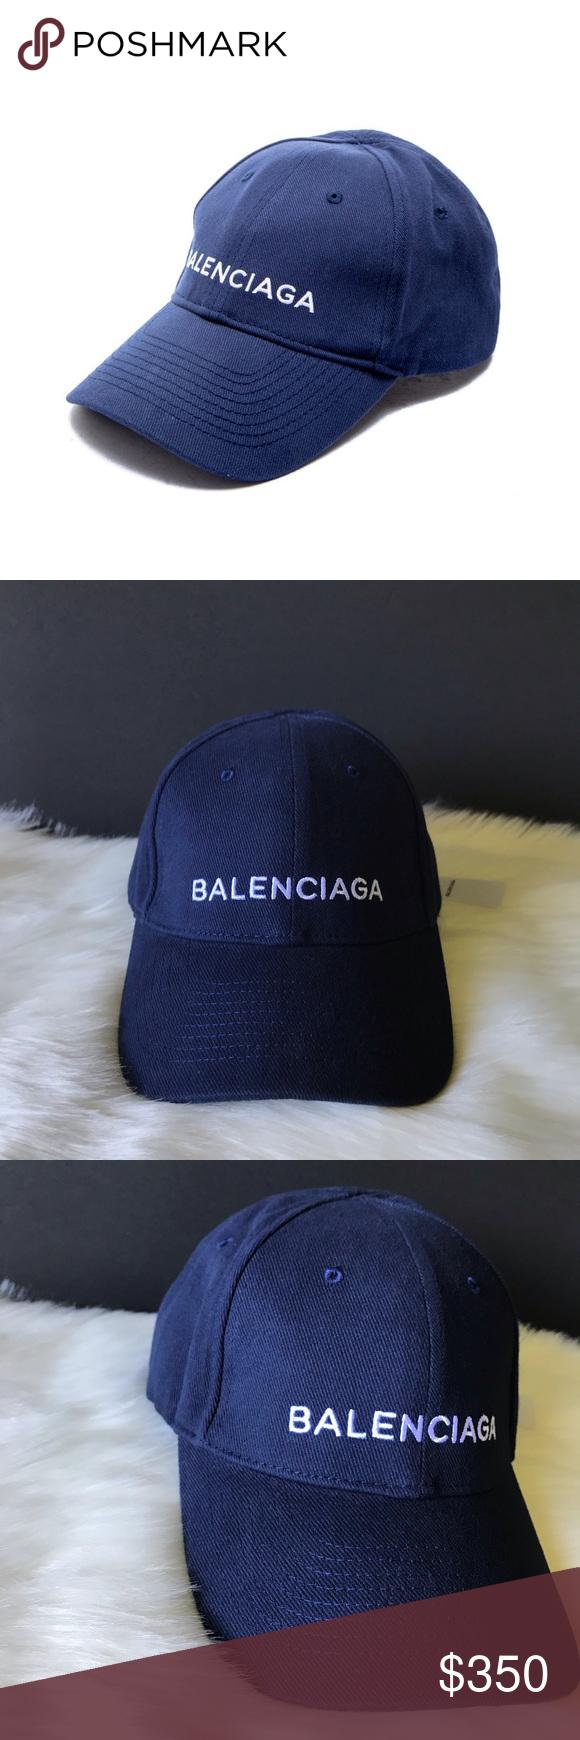 11799cb2547d8 Balenciaga Hat Cap Blue Balenciaga Hat Blue Composition  100% Cotton • Classic  baseball cap